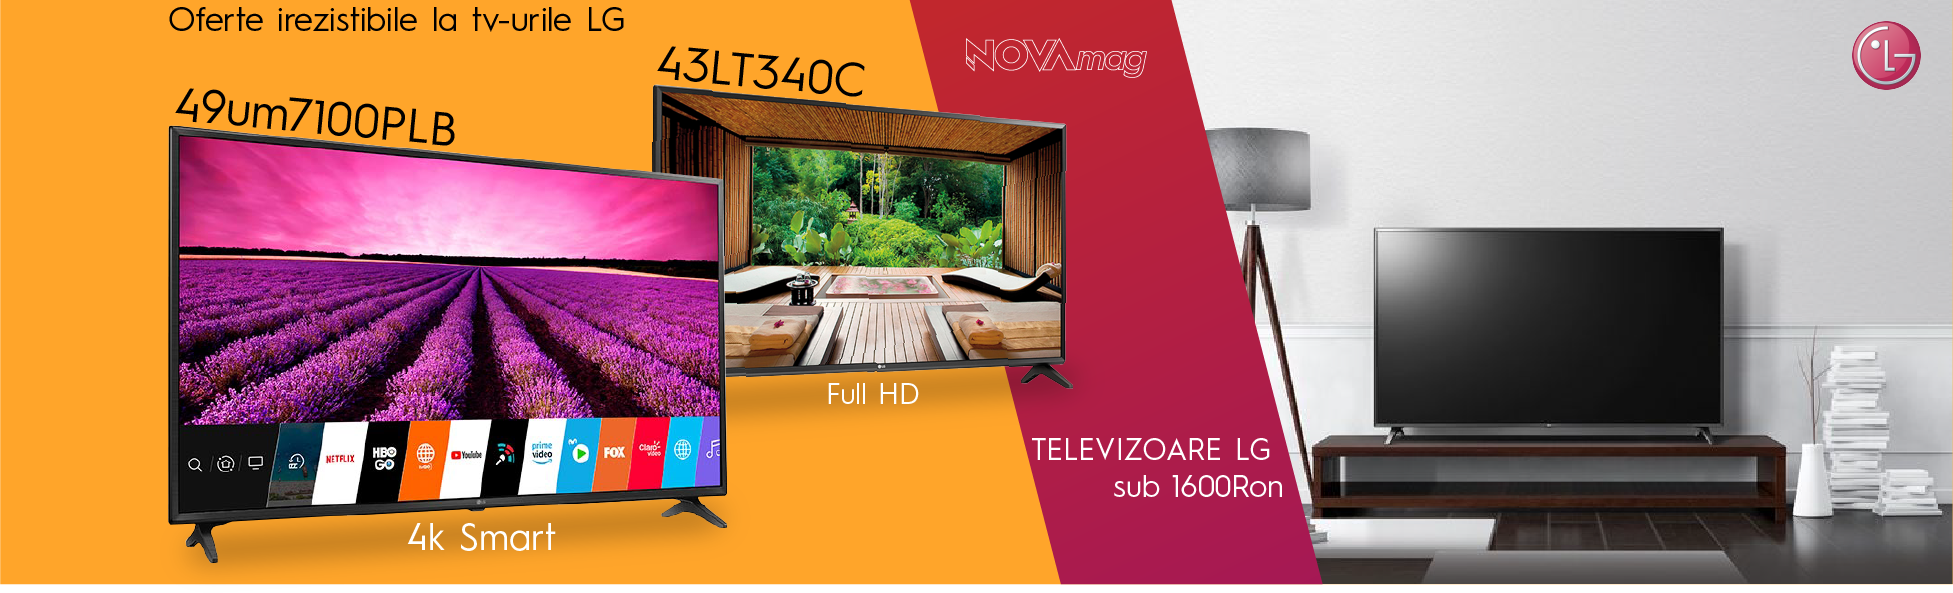 LG TV PROMO 2